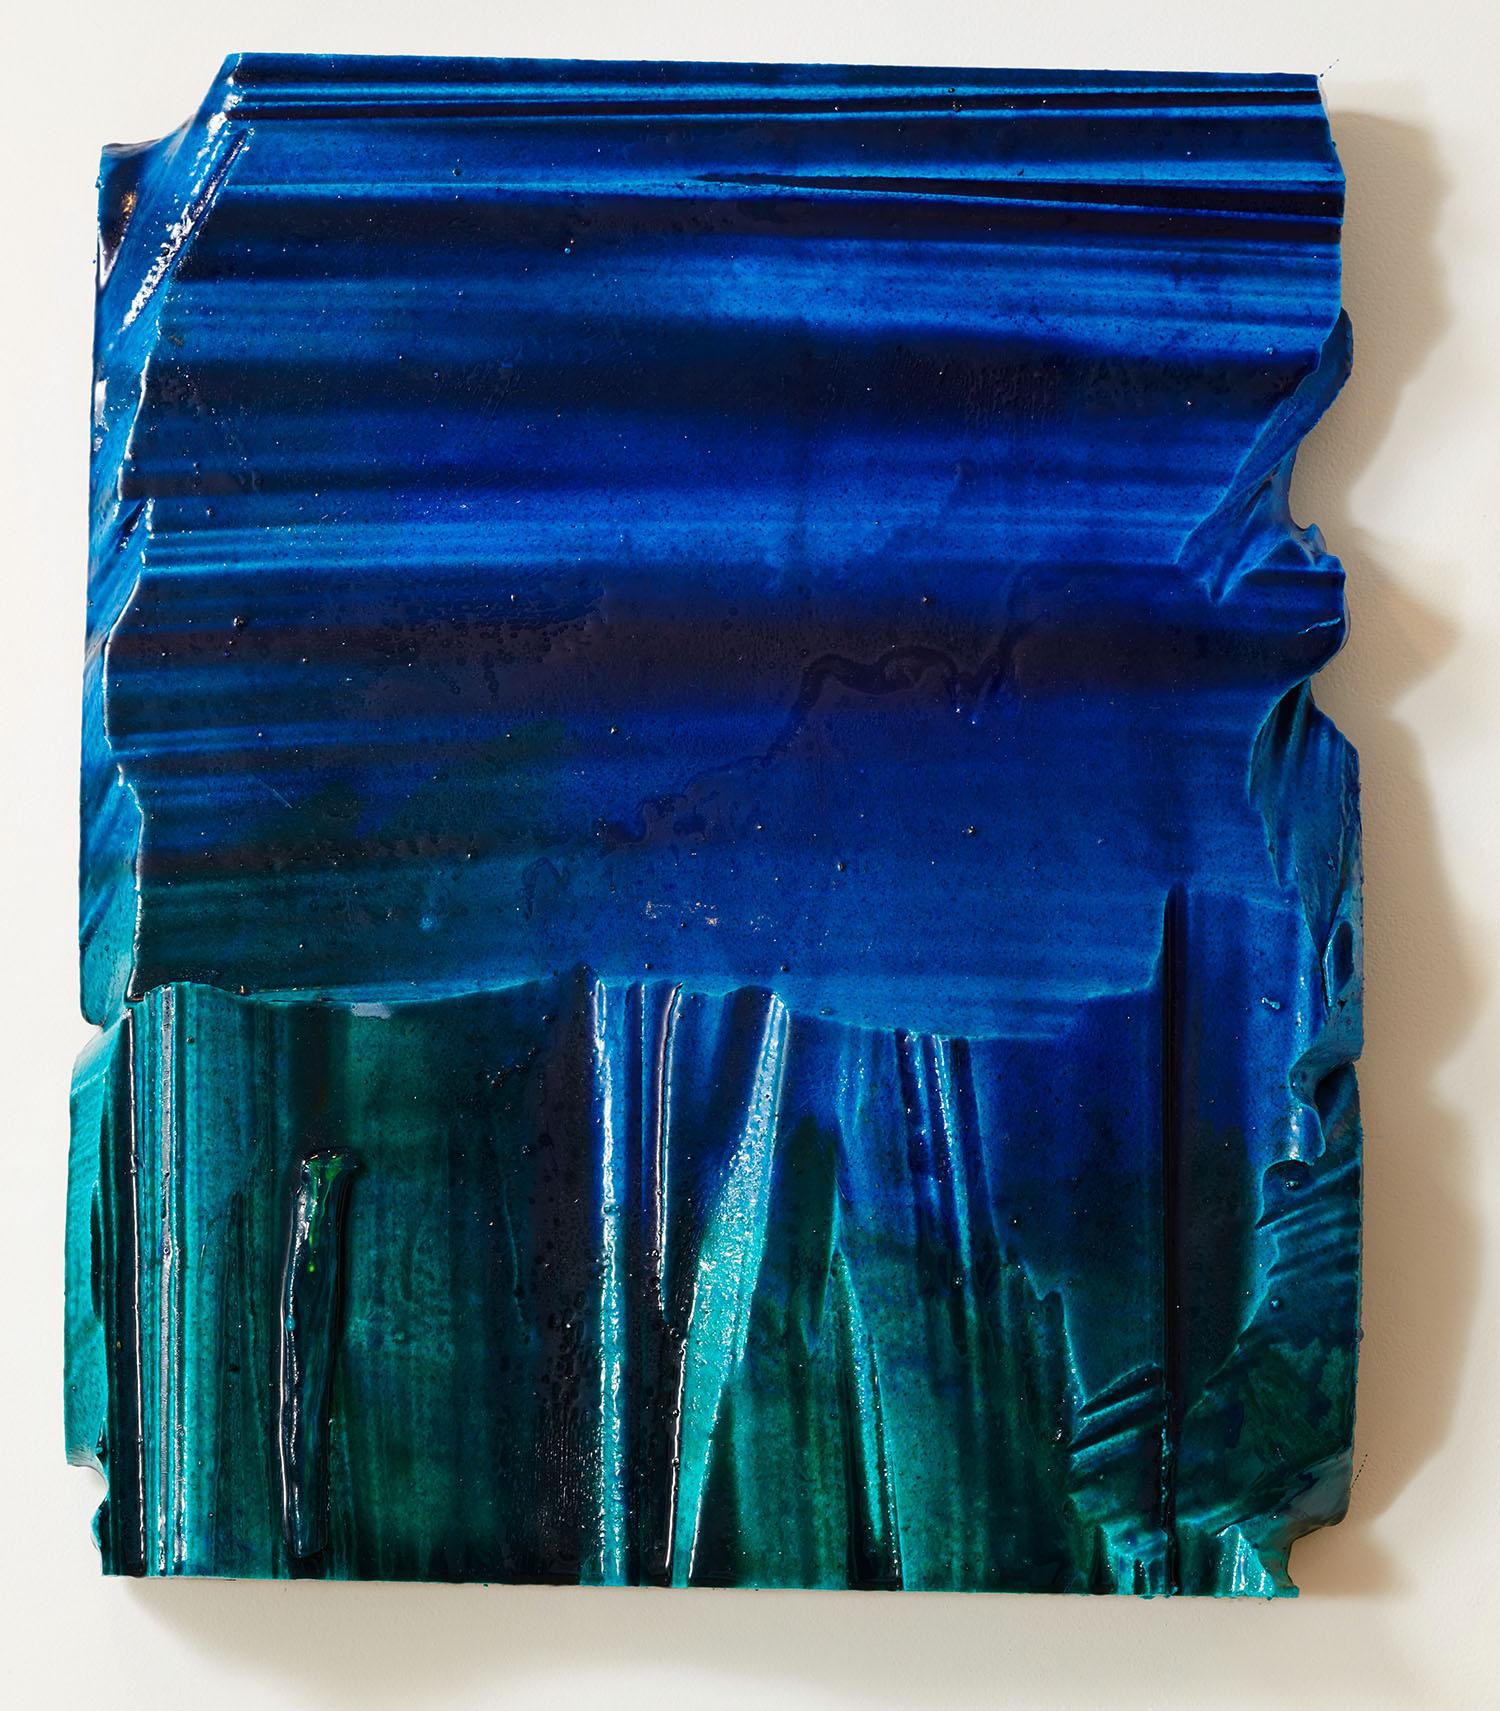 The Inside Foil: Richard Palmer